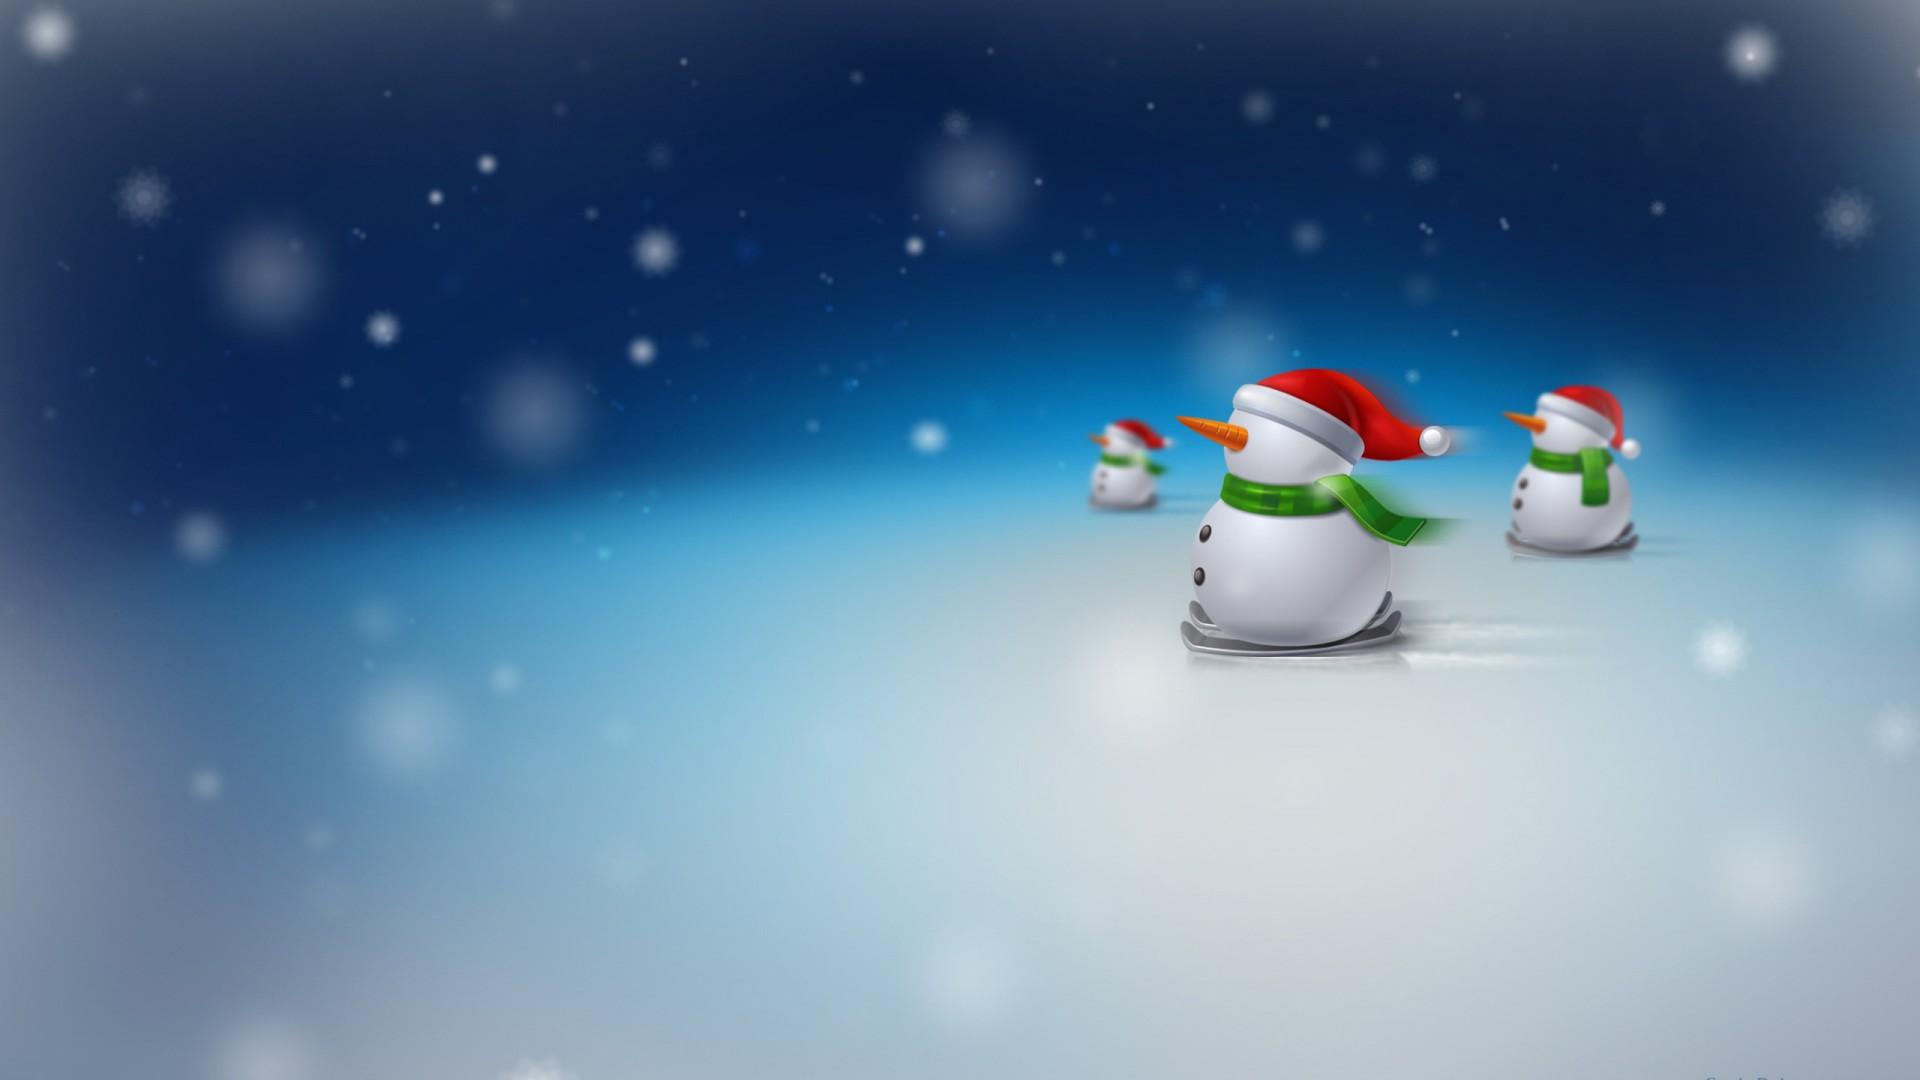 Snowman Cute Wallpapers Christmas Snowman Santa Hats Wallpapers Hd Wallpapers